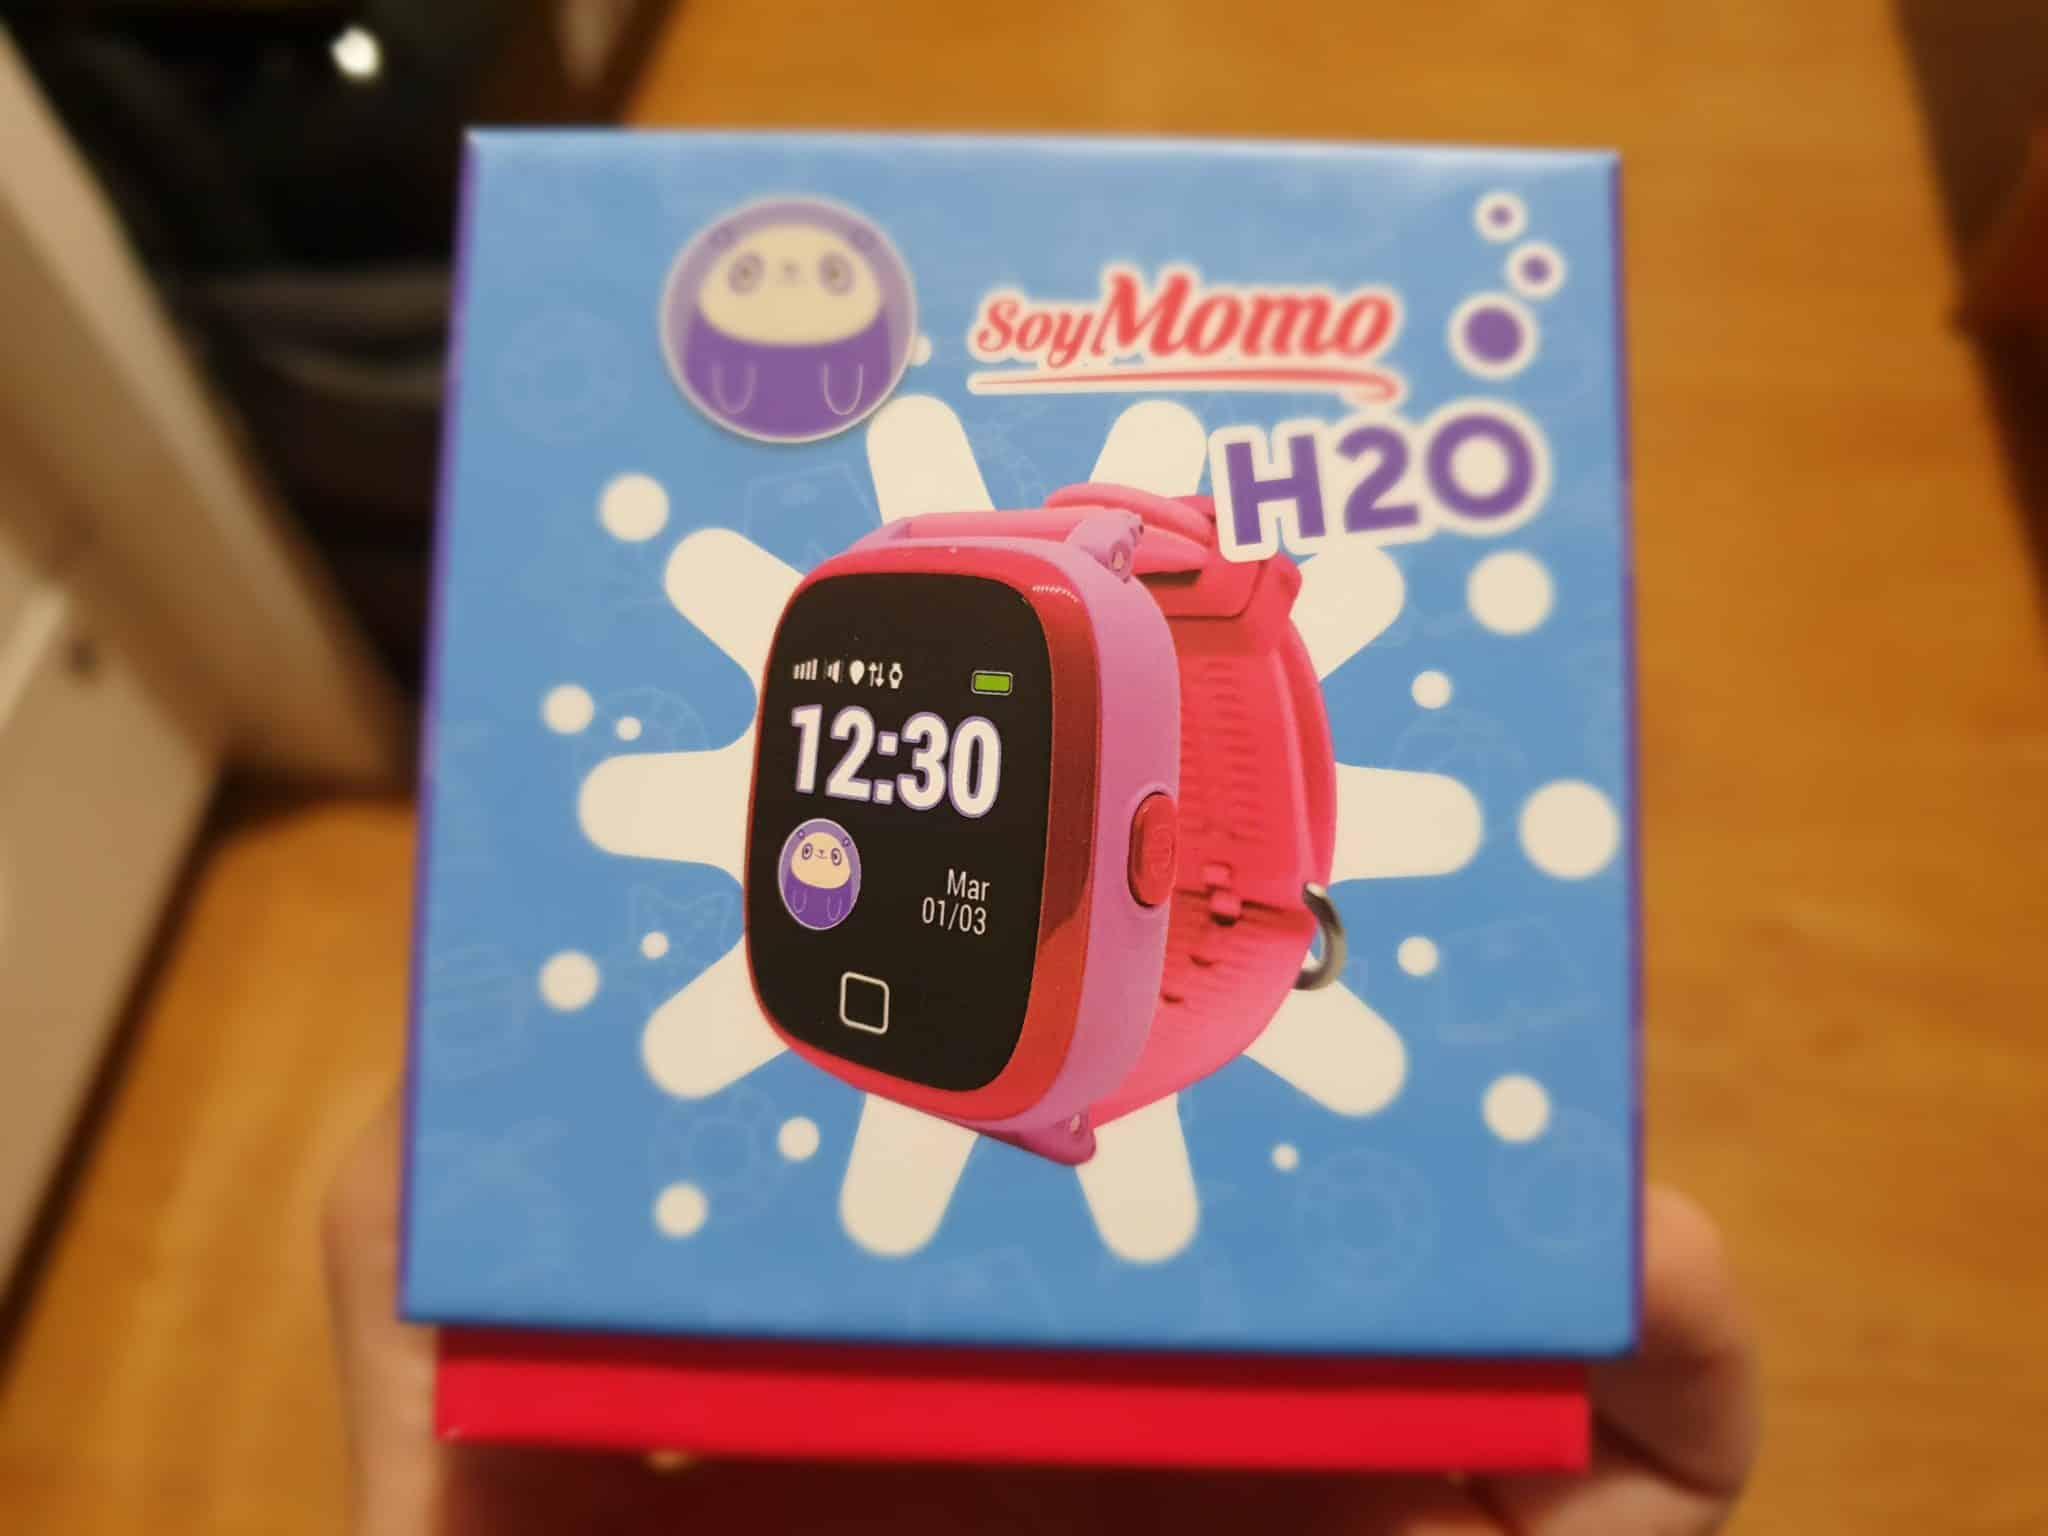 Reloj SoyMomo H2O